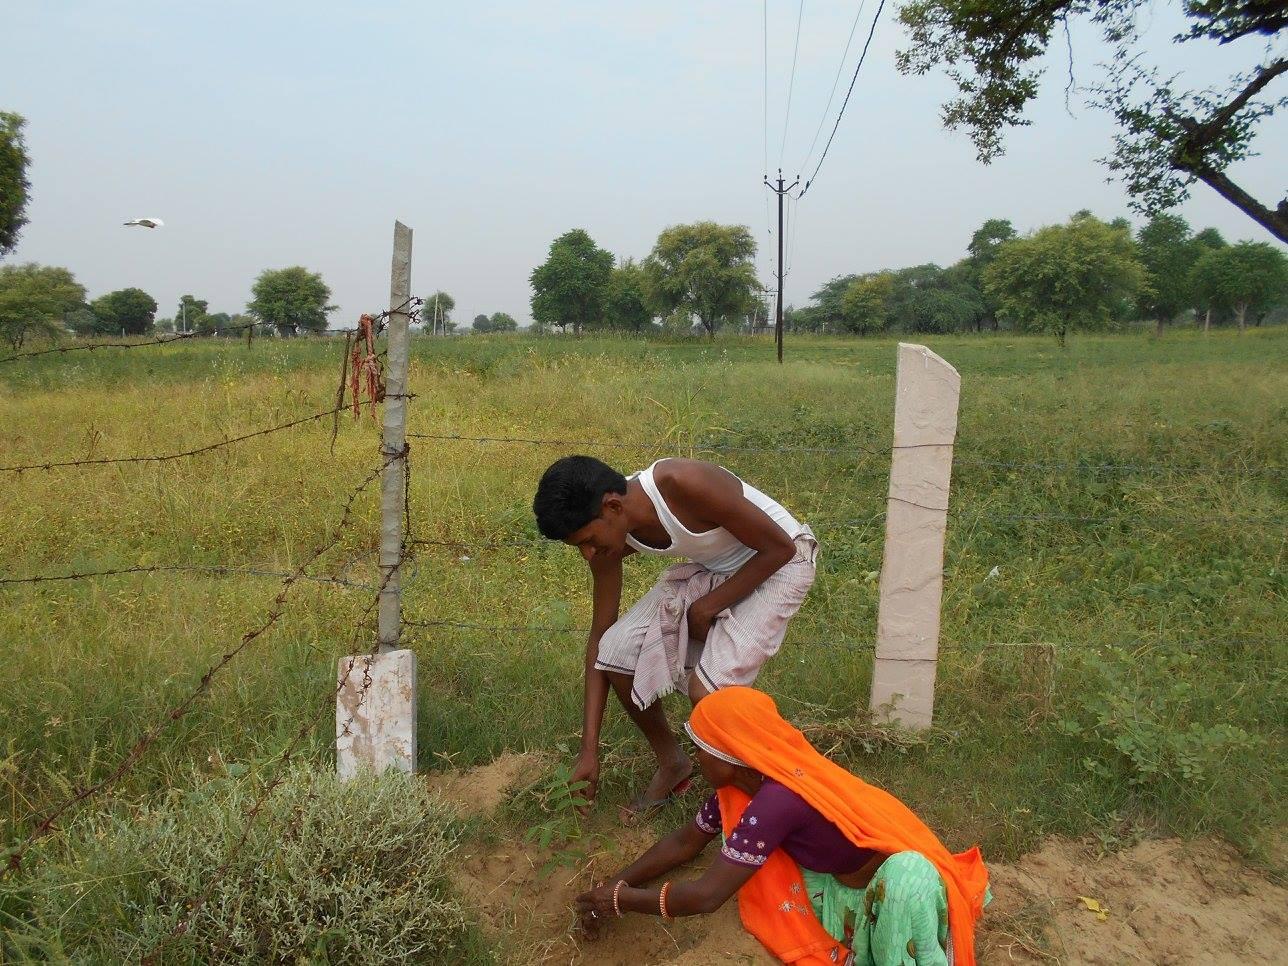 Sugna and Vinod planting